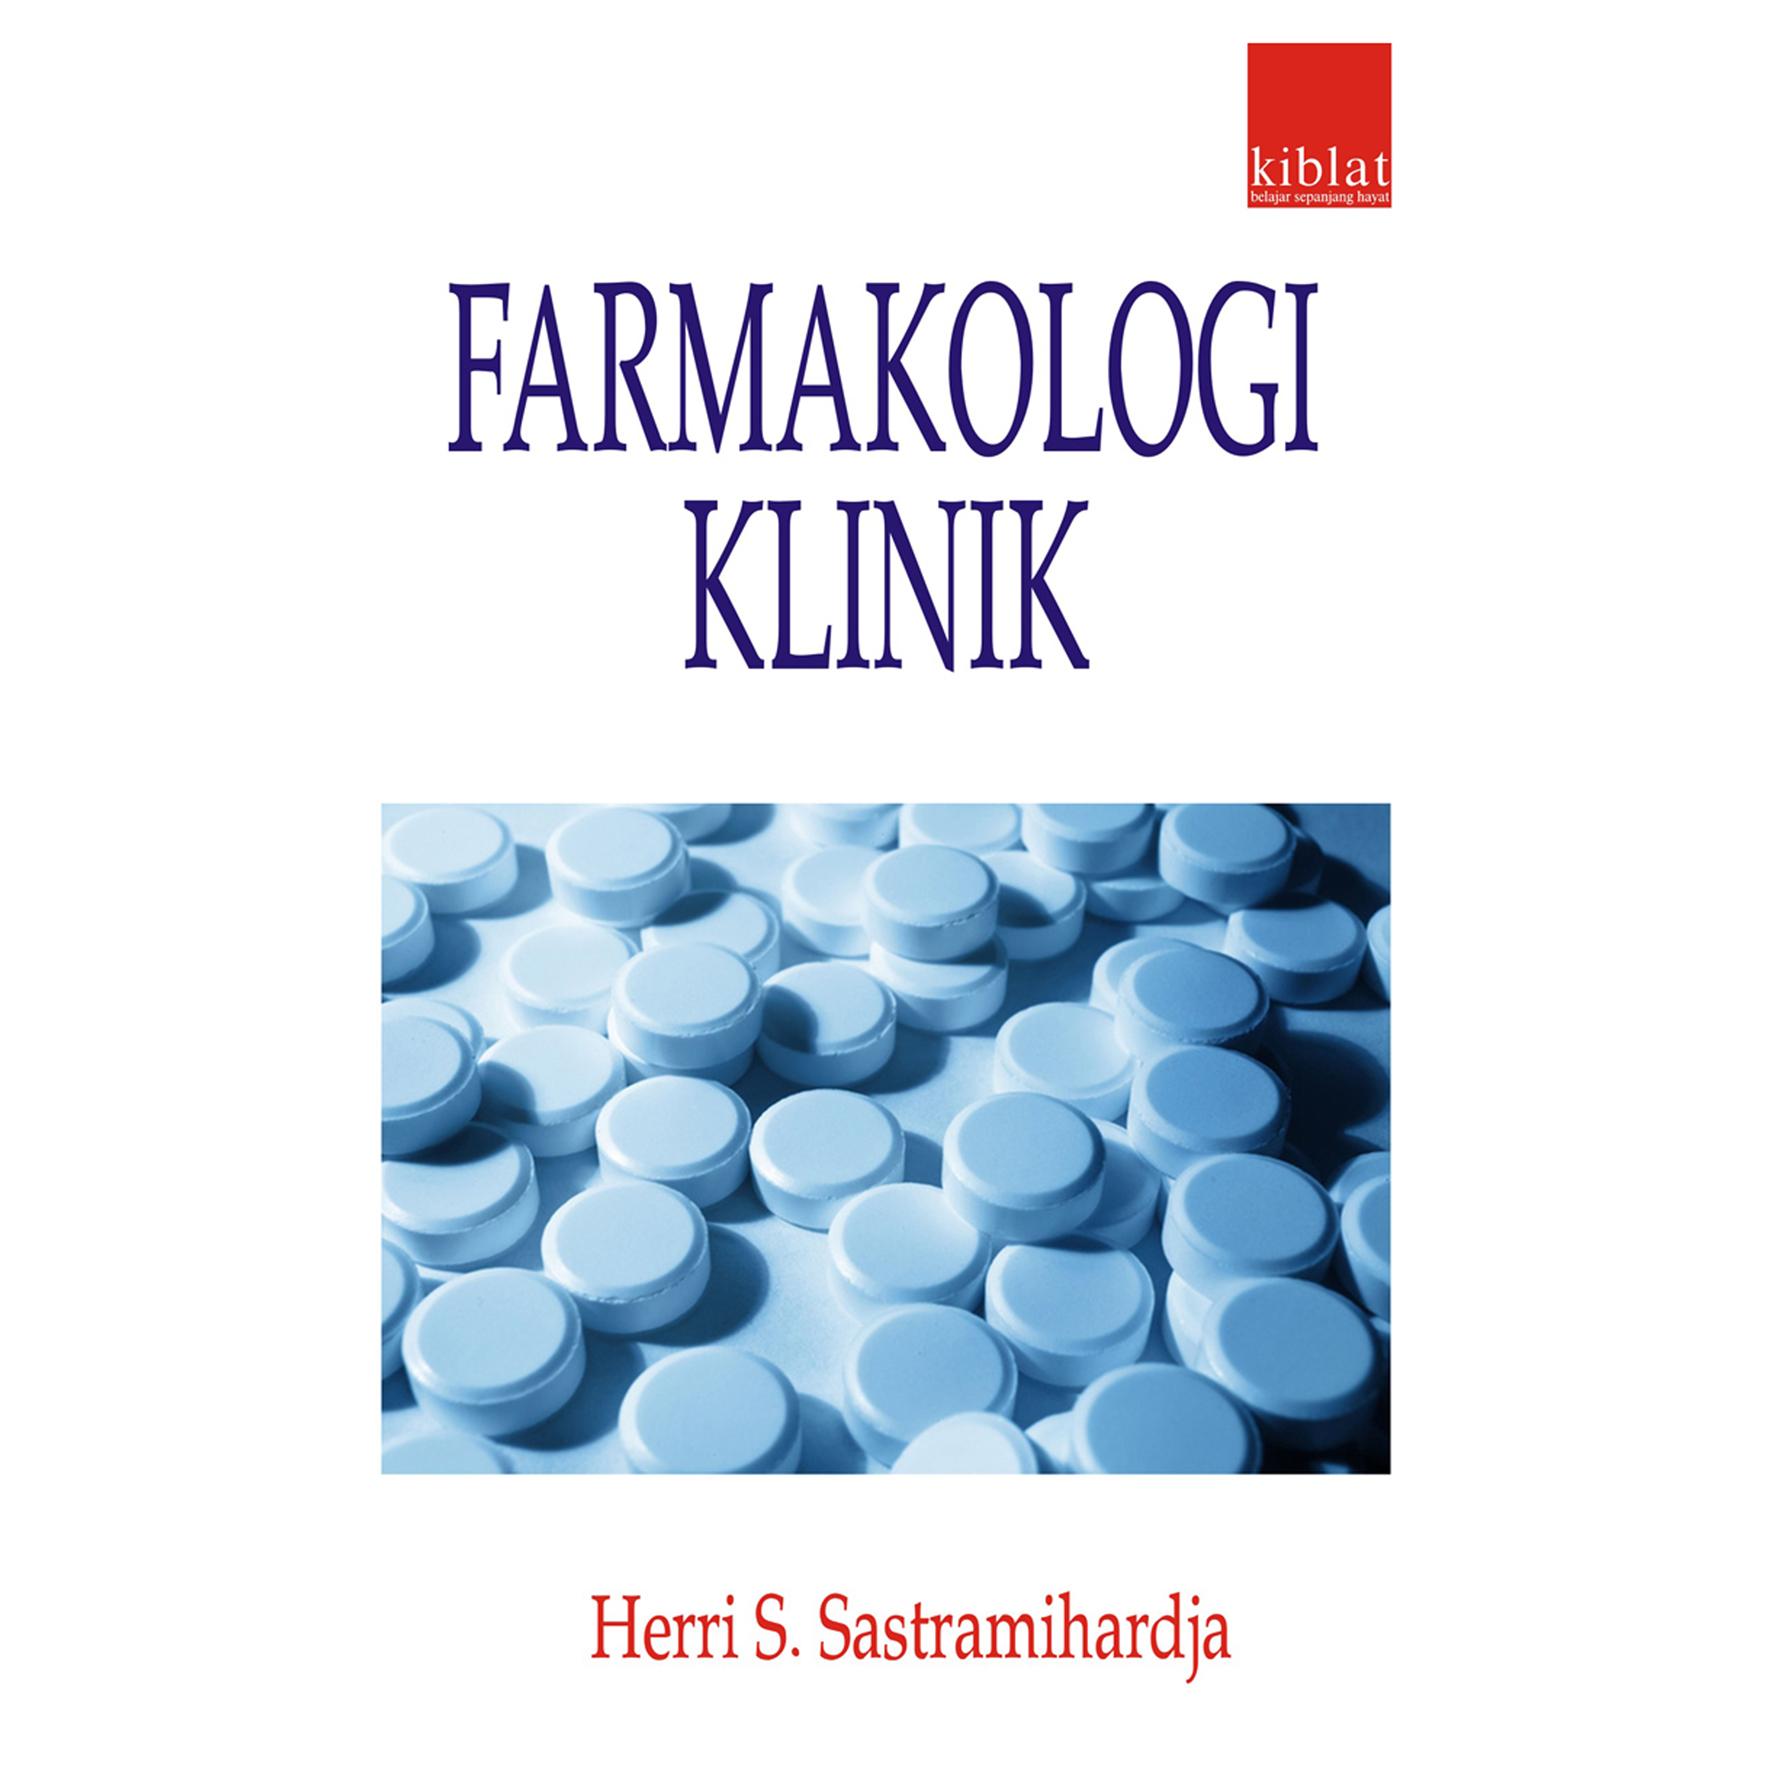 Kiblat Buku - Farmakologi Klinik